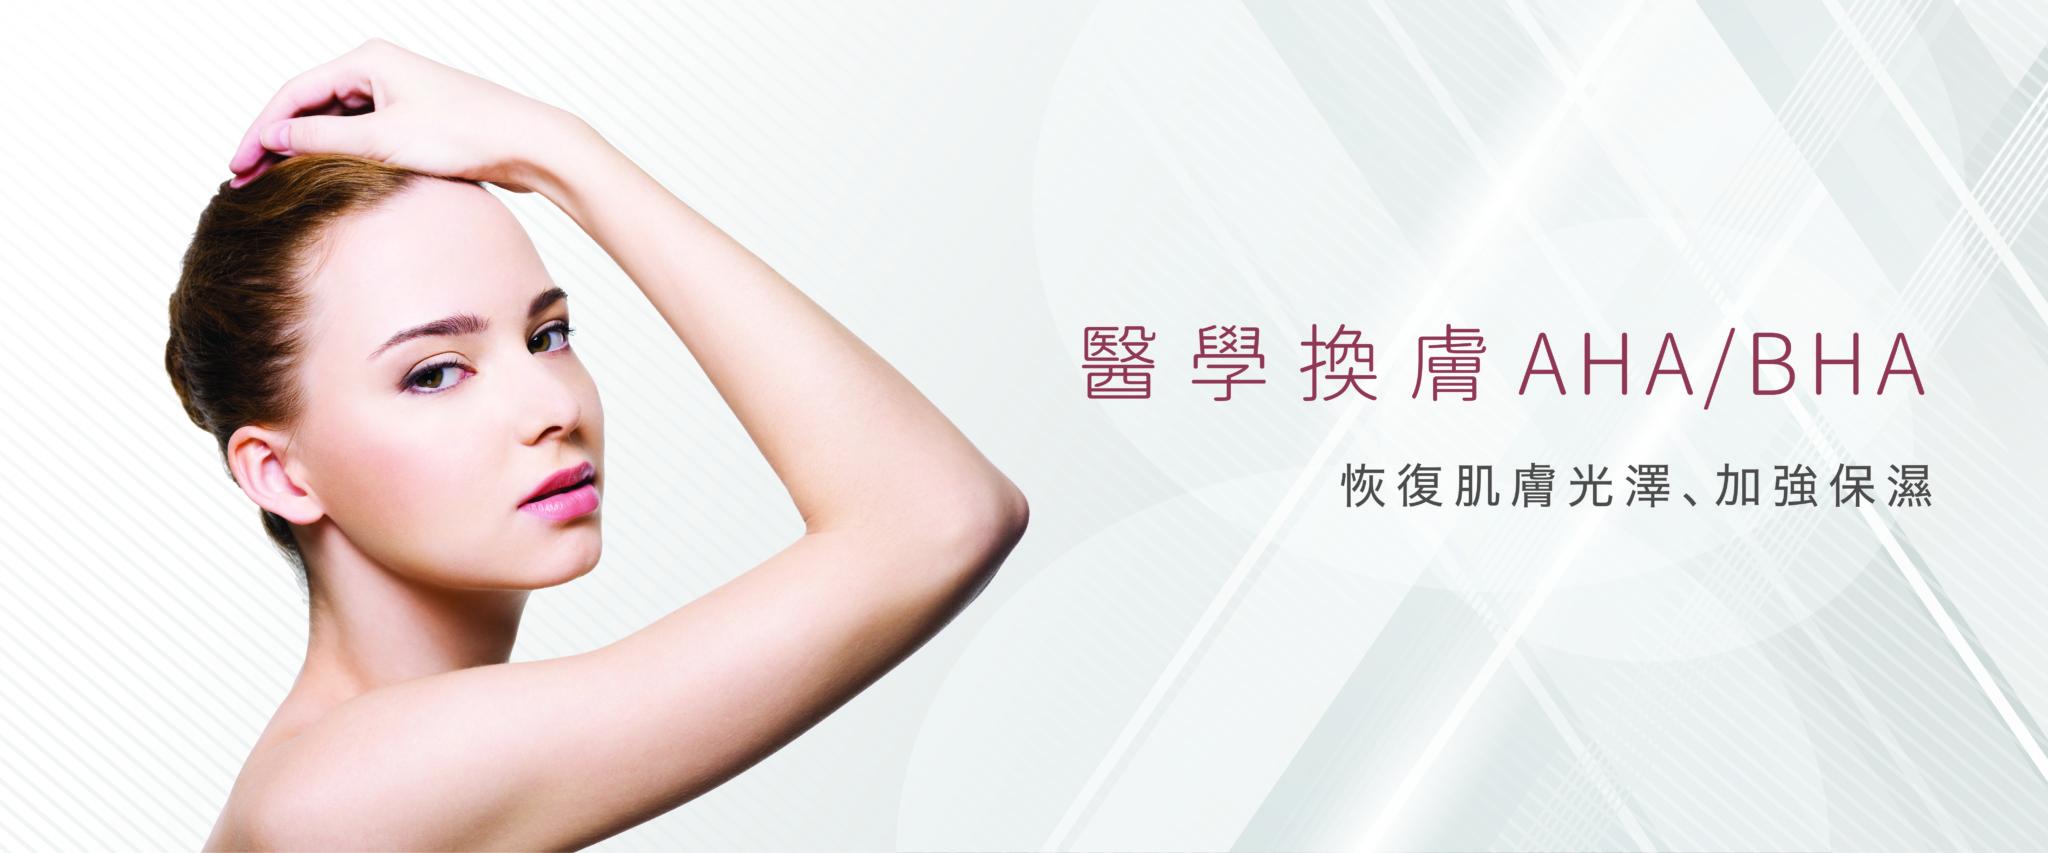 BHA水楊酸banner